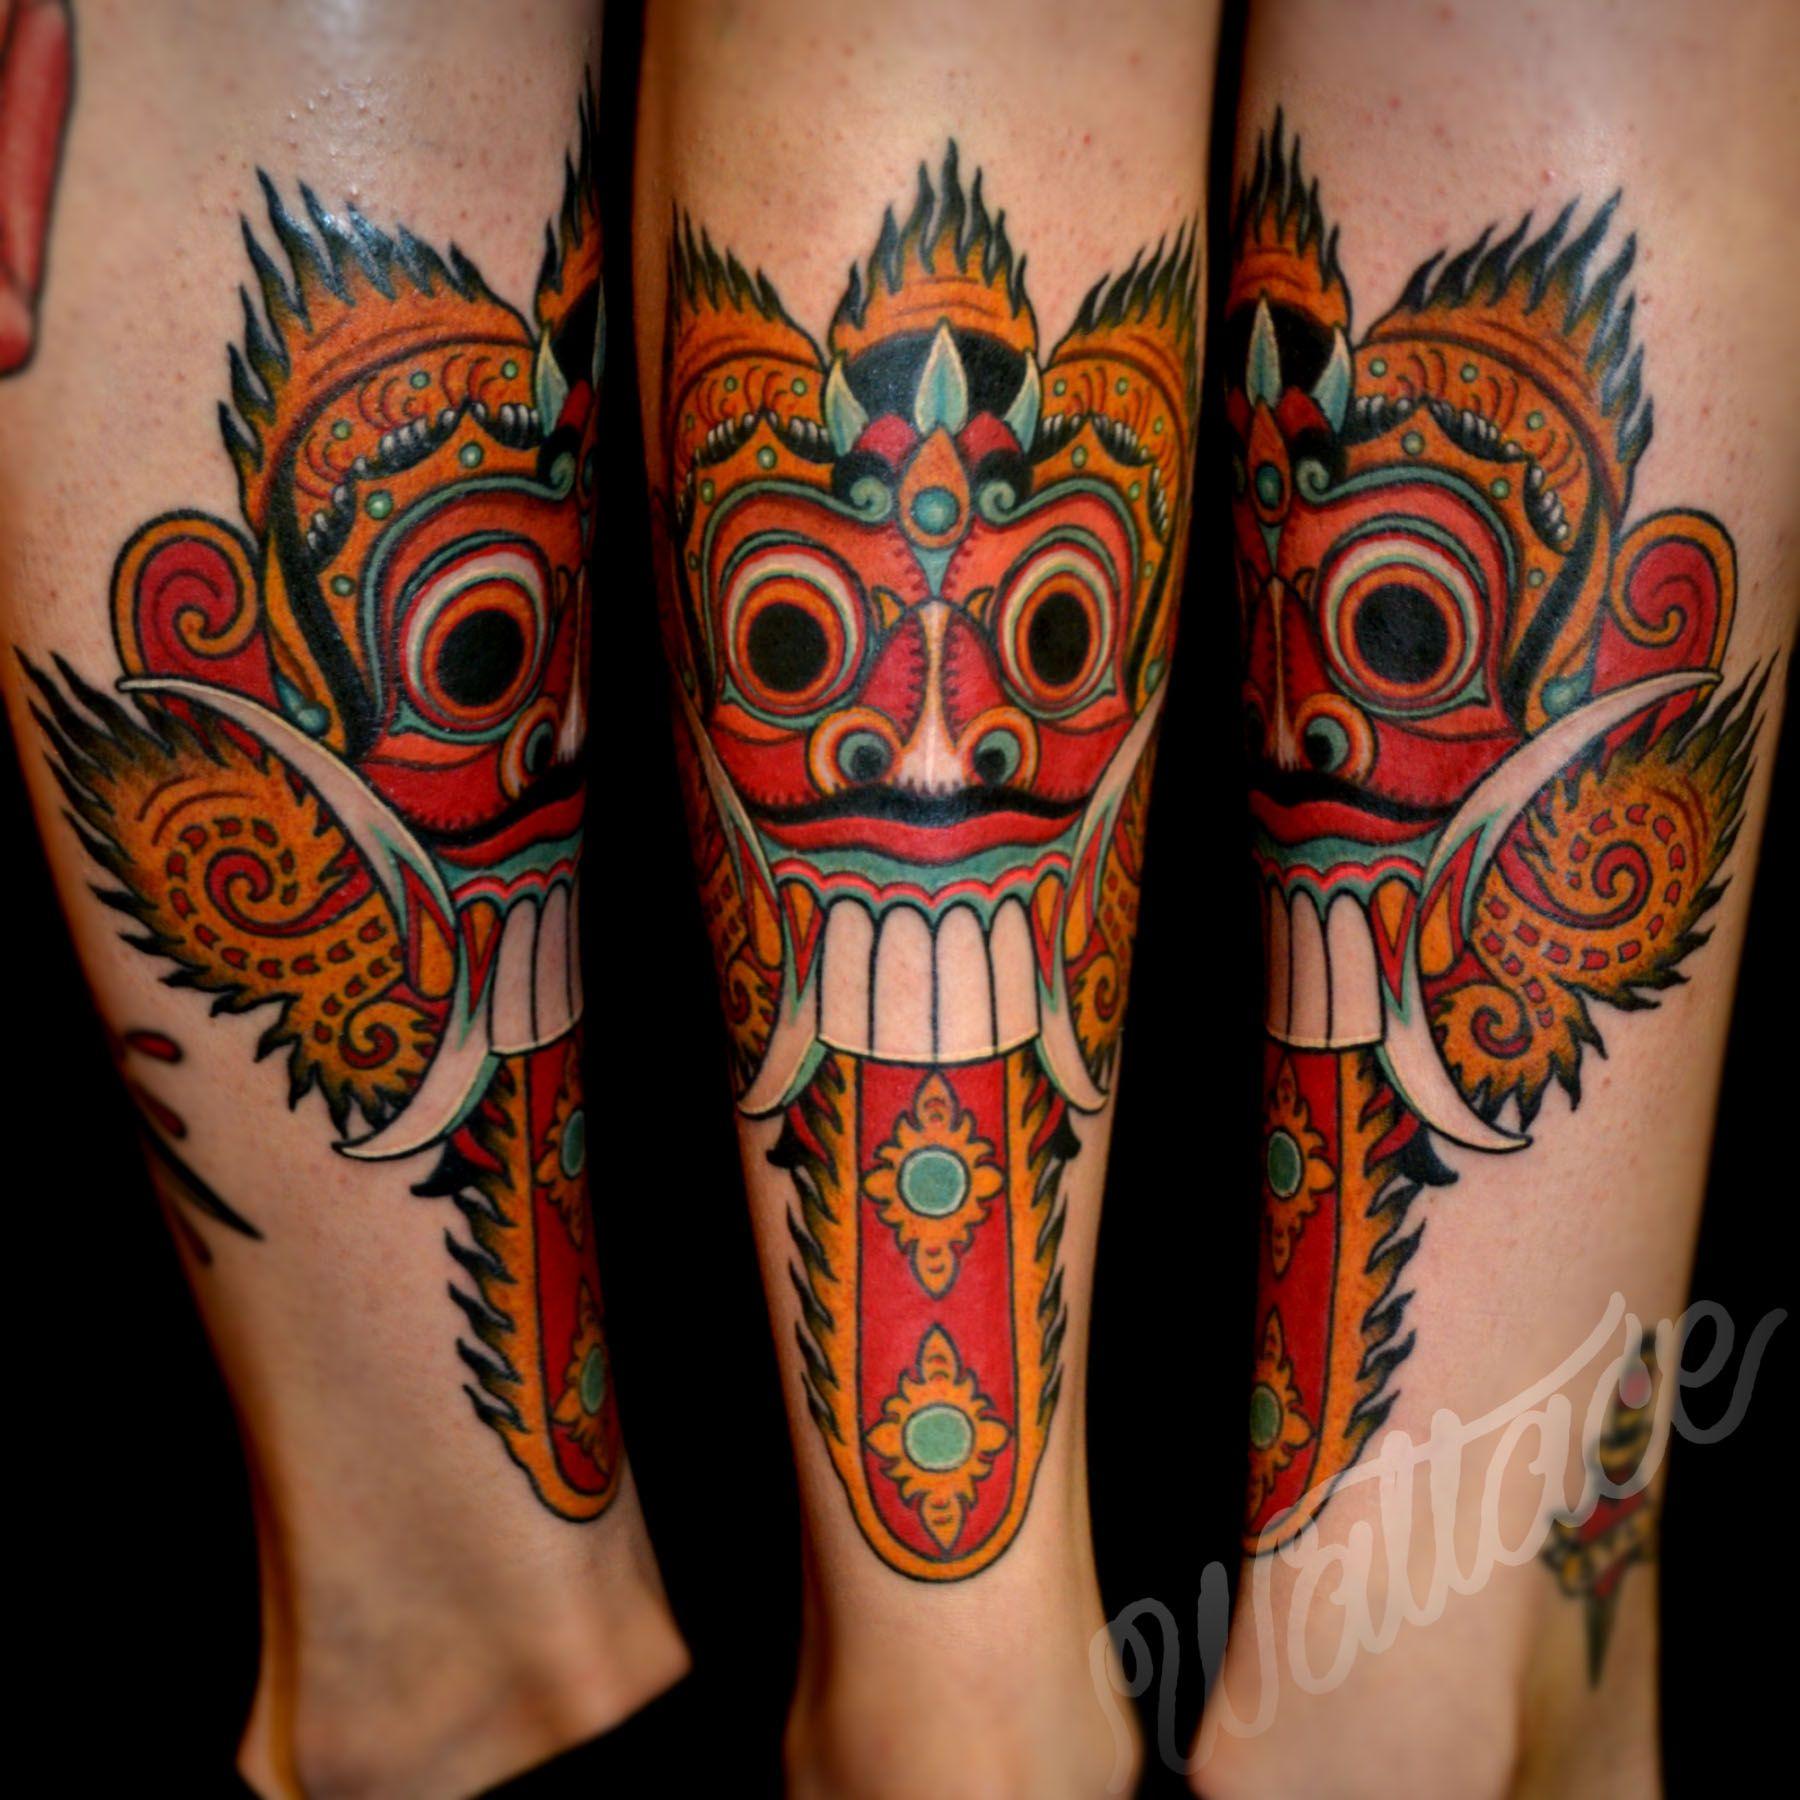 balinese garuda tattoo design google zoeken tats pinterest balinese tattoo designs and. Black Bedroom Furniture Sets. Home Design Ideas